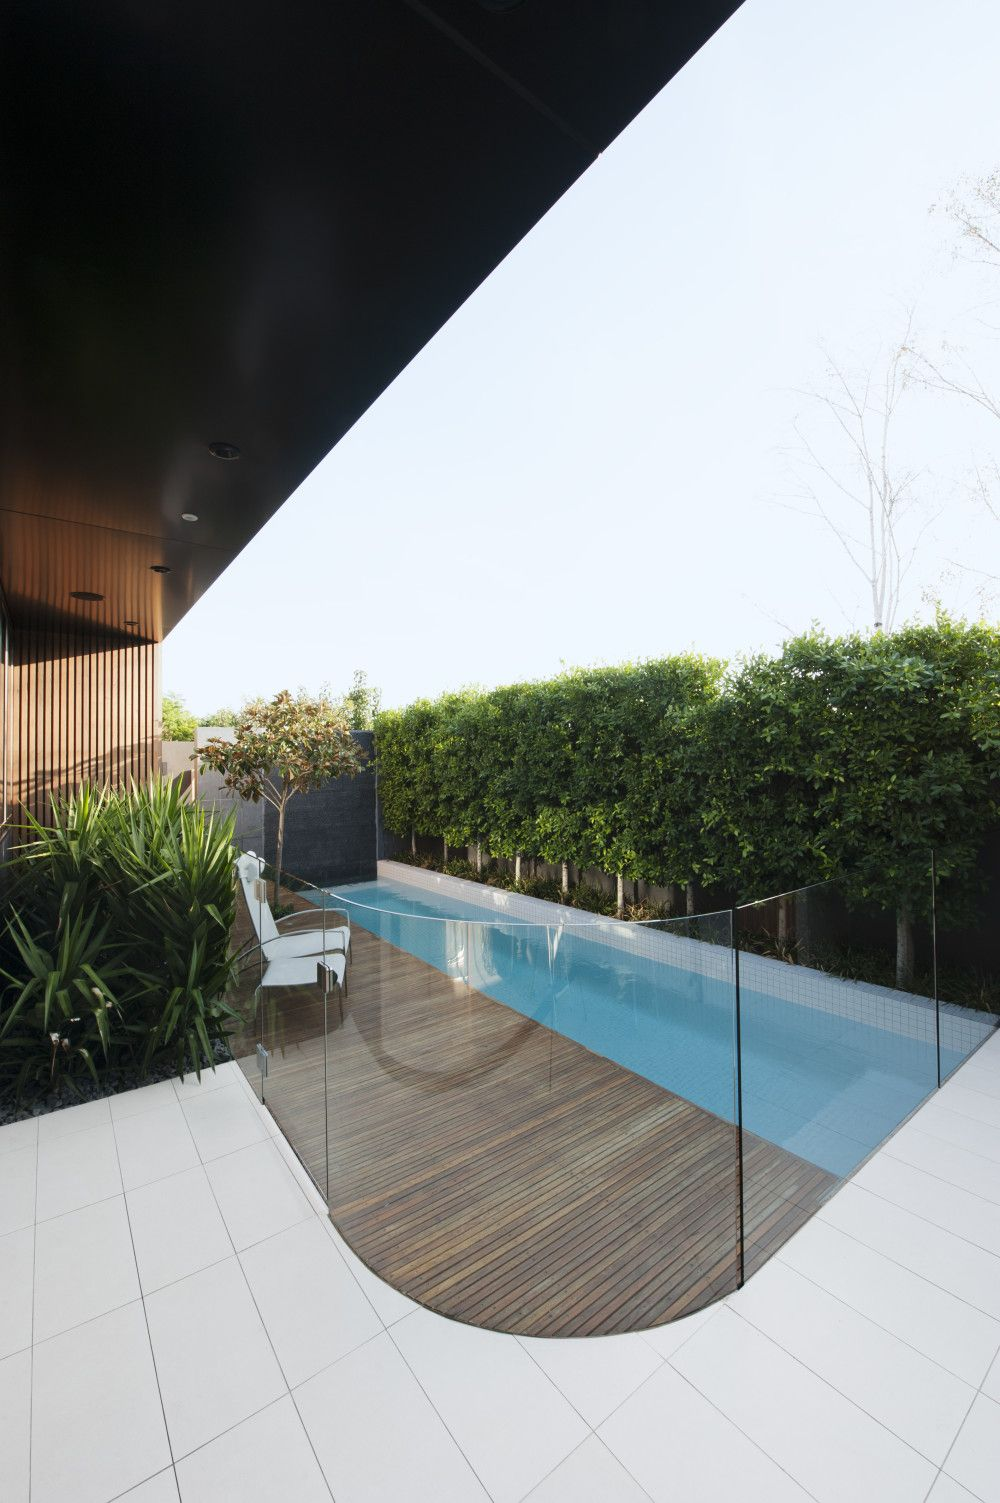 Pool Fencing Frameless Impressions Backyard pool